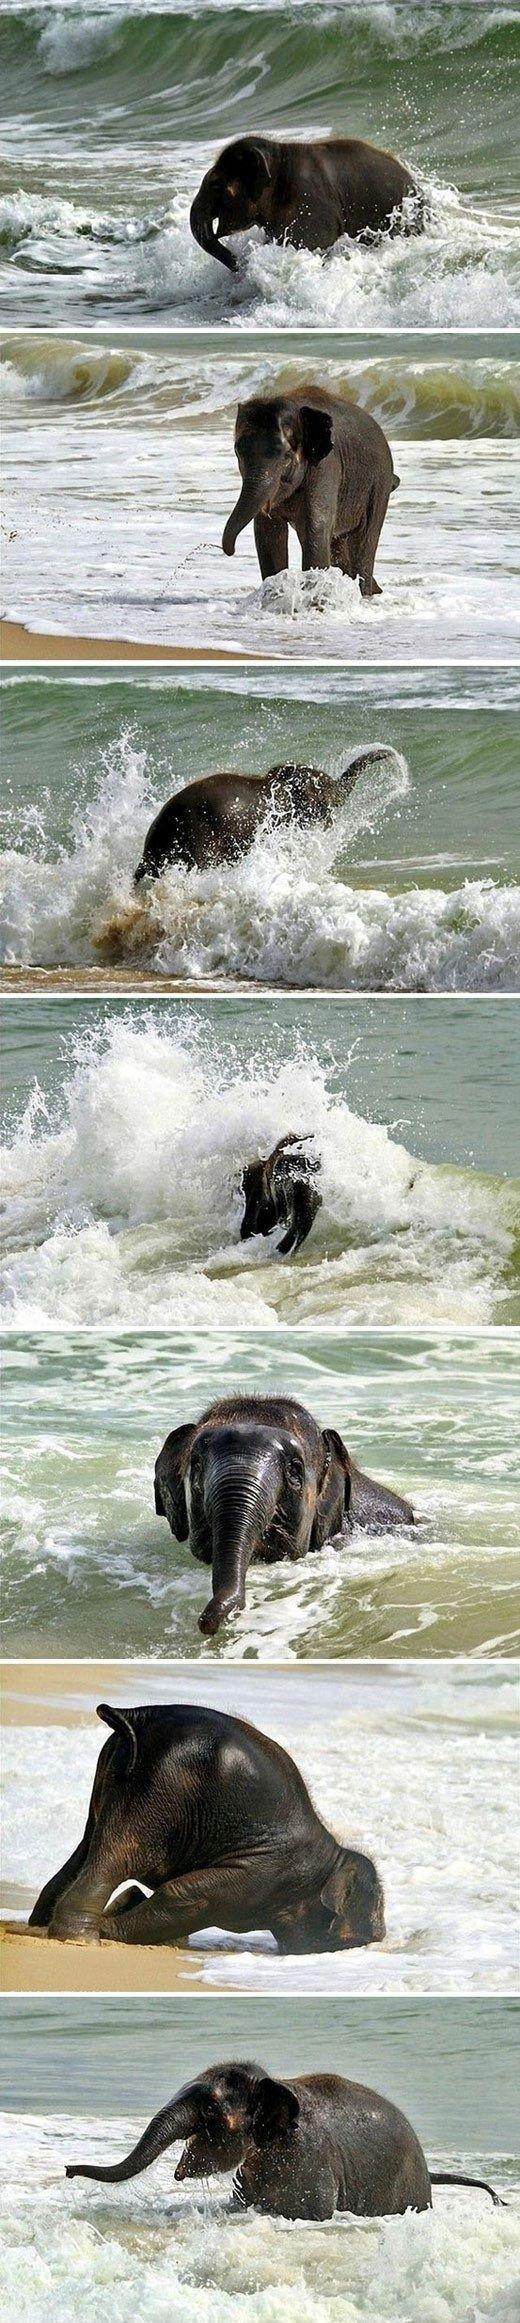 J'aime les éléphants :)